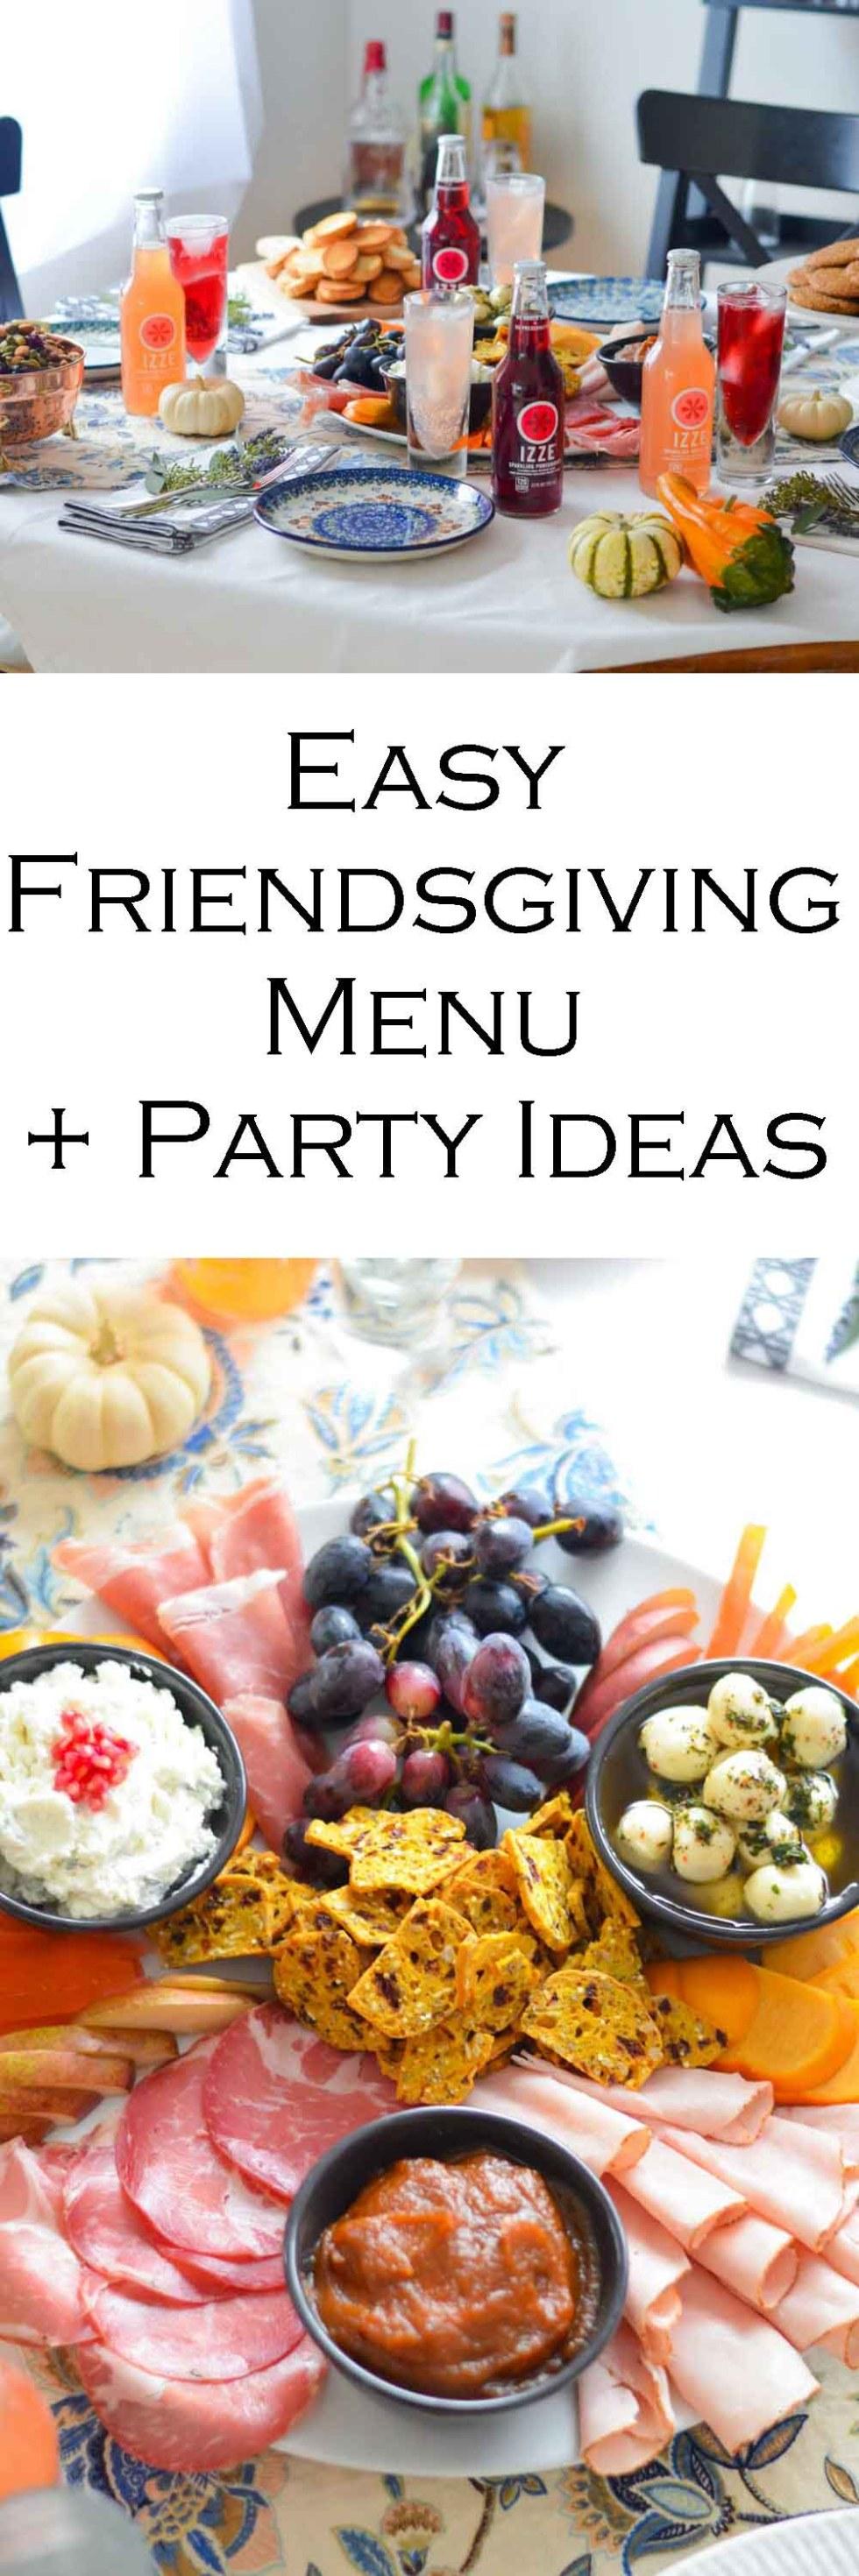 Easy Friendsgiving Ideas + Party Menu #friendsgiving #charctuerie #entertaining #hostess #meatplatter #cheeseplatter #hosting #foodideas #foodbloggers